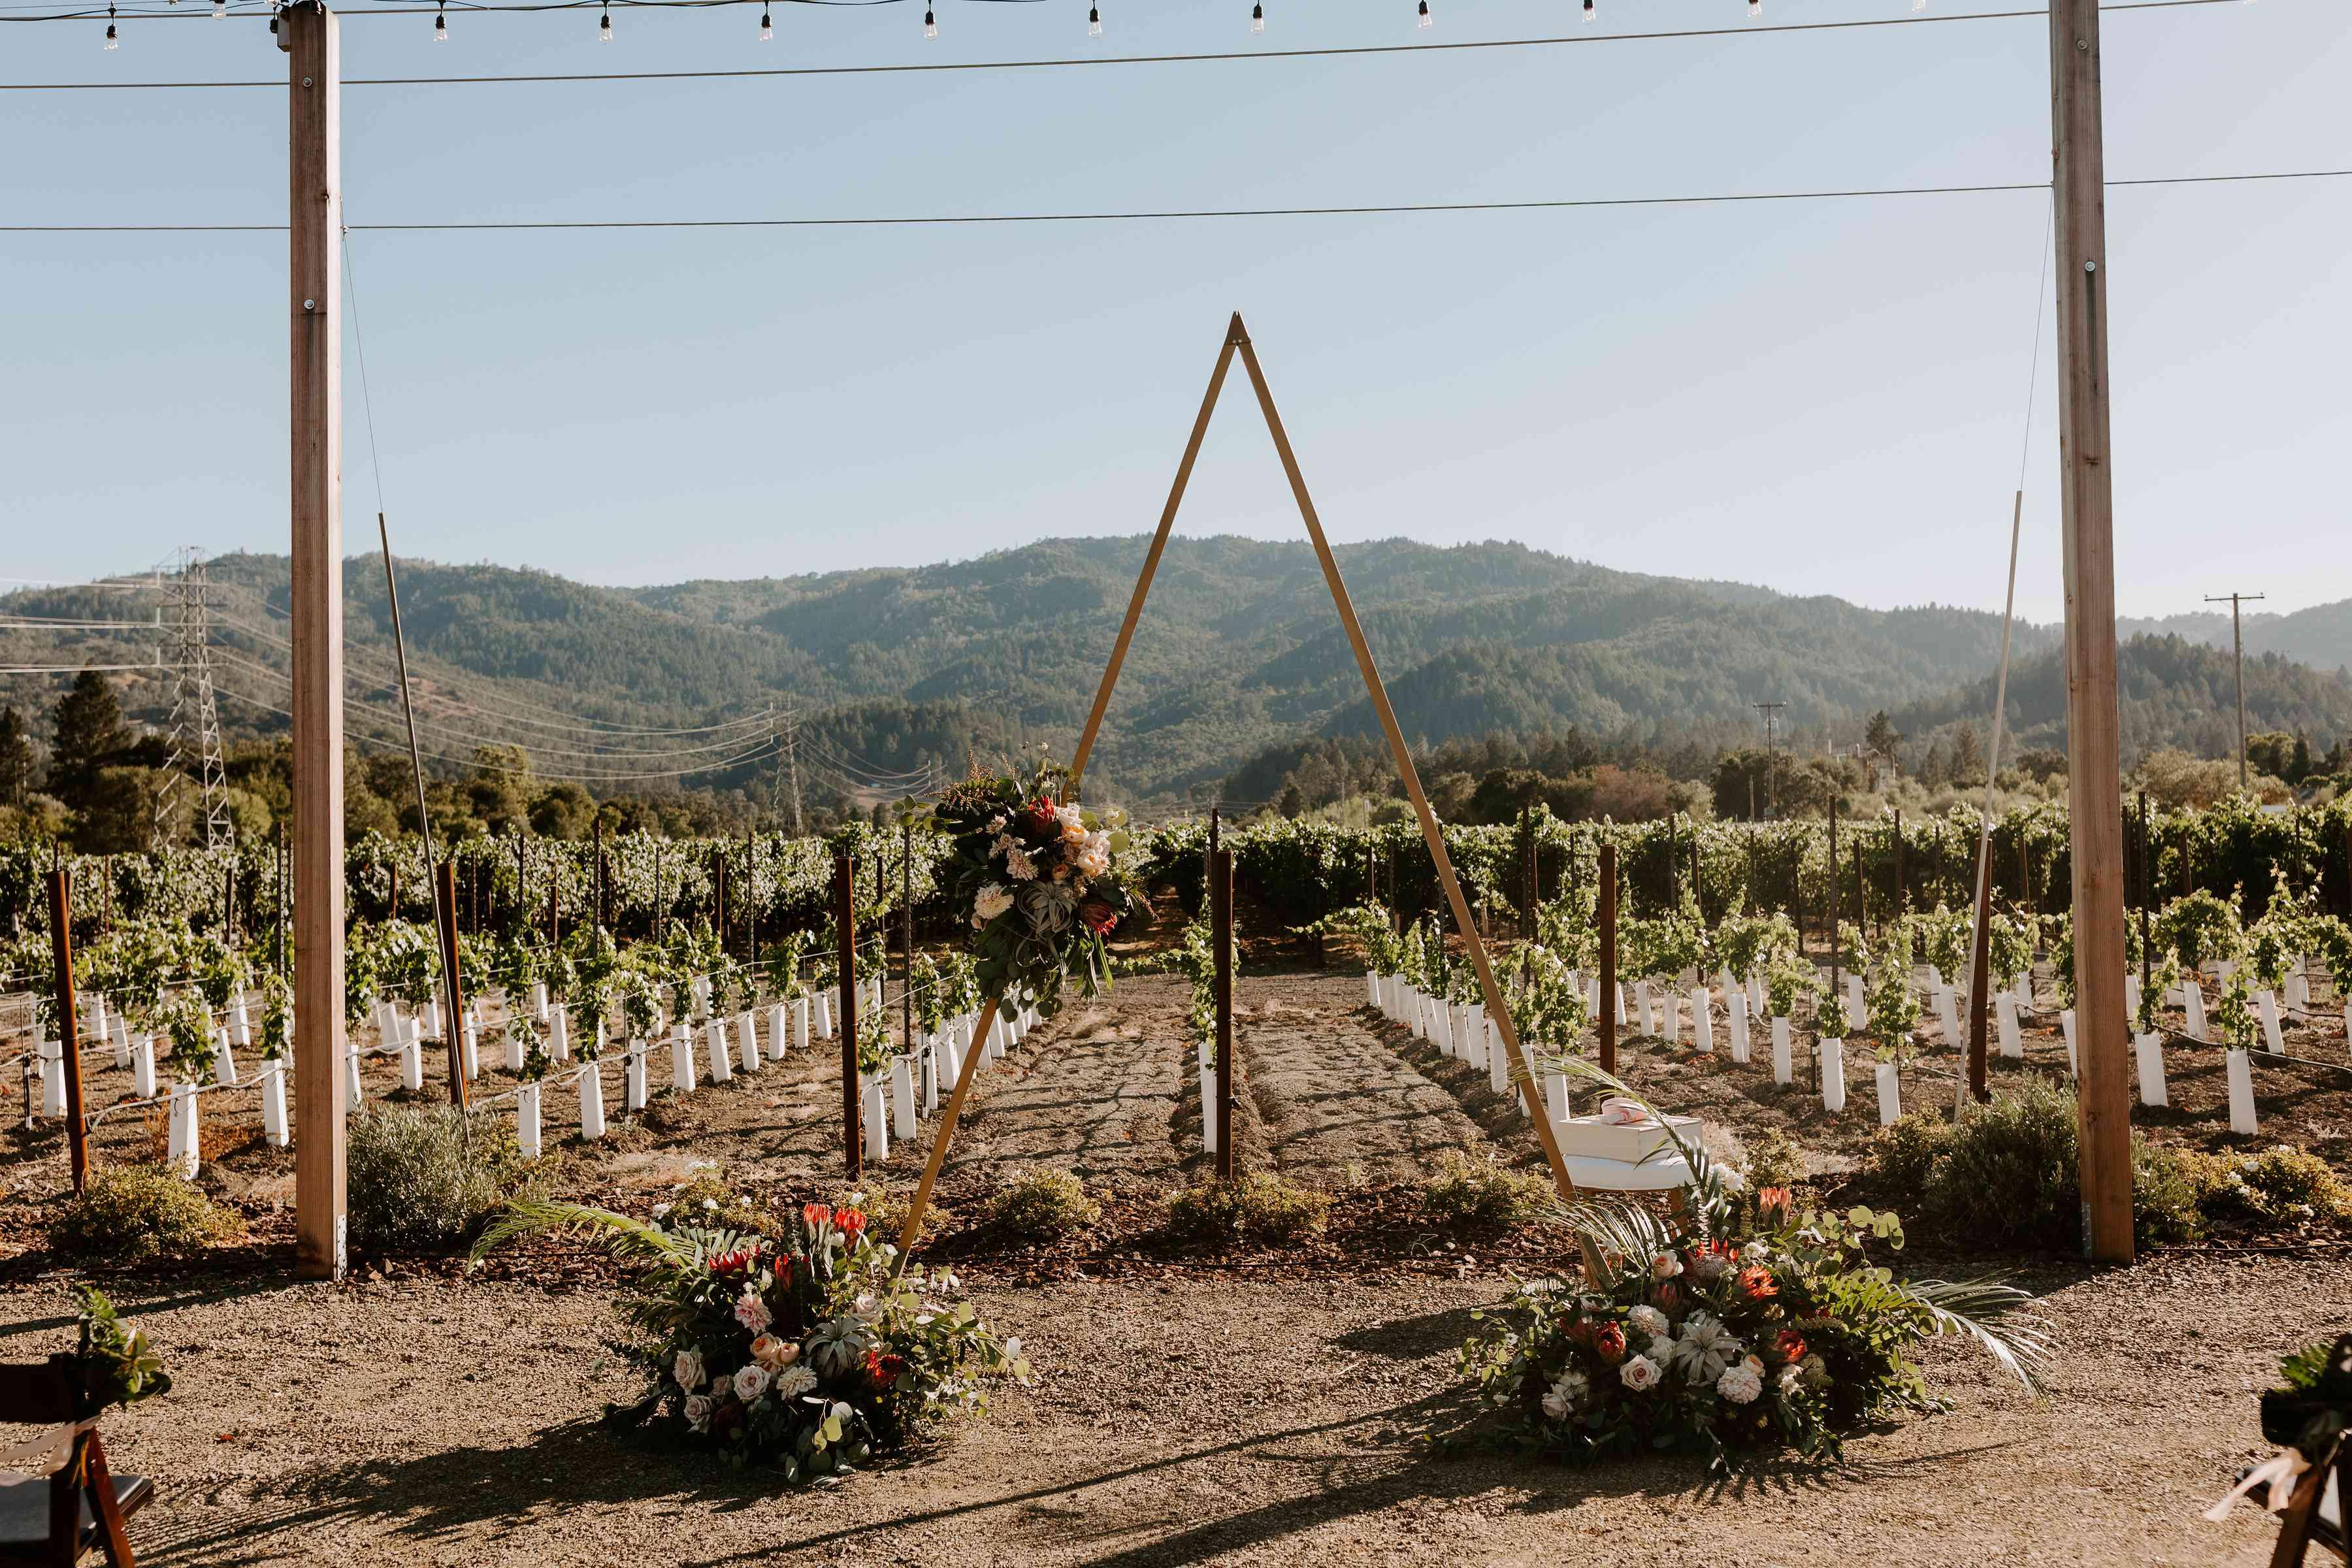 <p>vineyard ceremony setting</p><br><br>